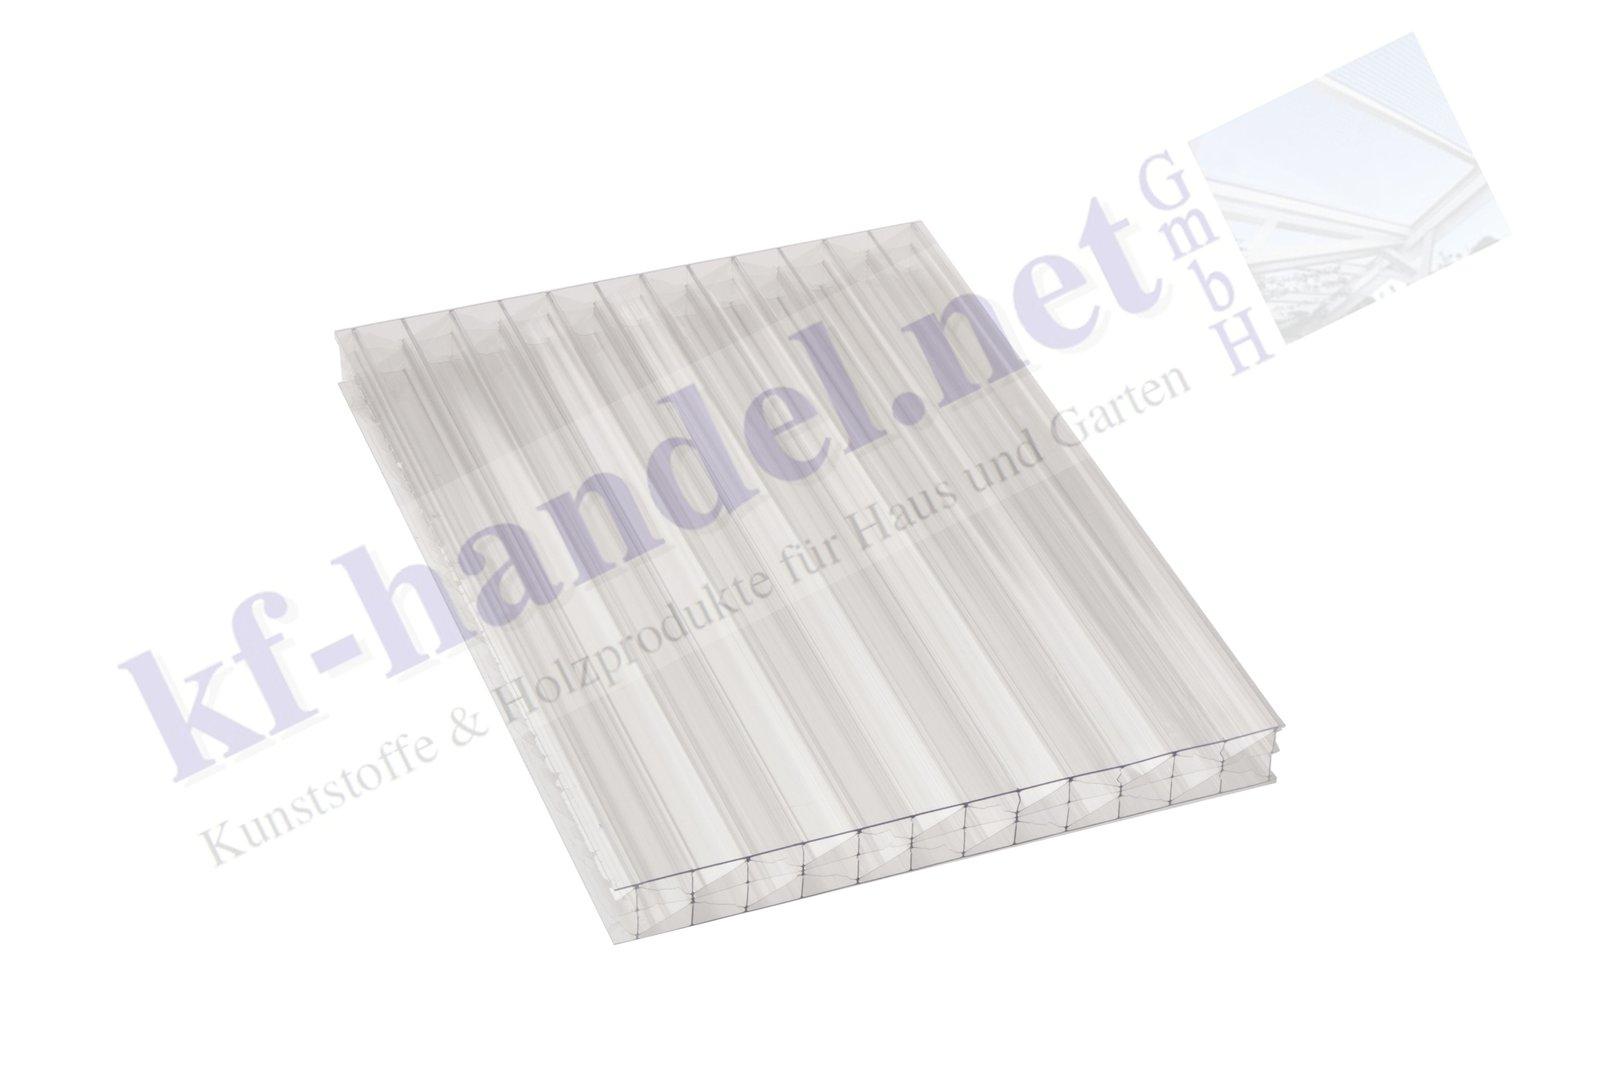 Polycarbonat Makrolon Stegplatten Hohlkammerplatten Kaufen Neu